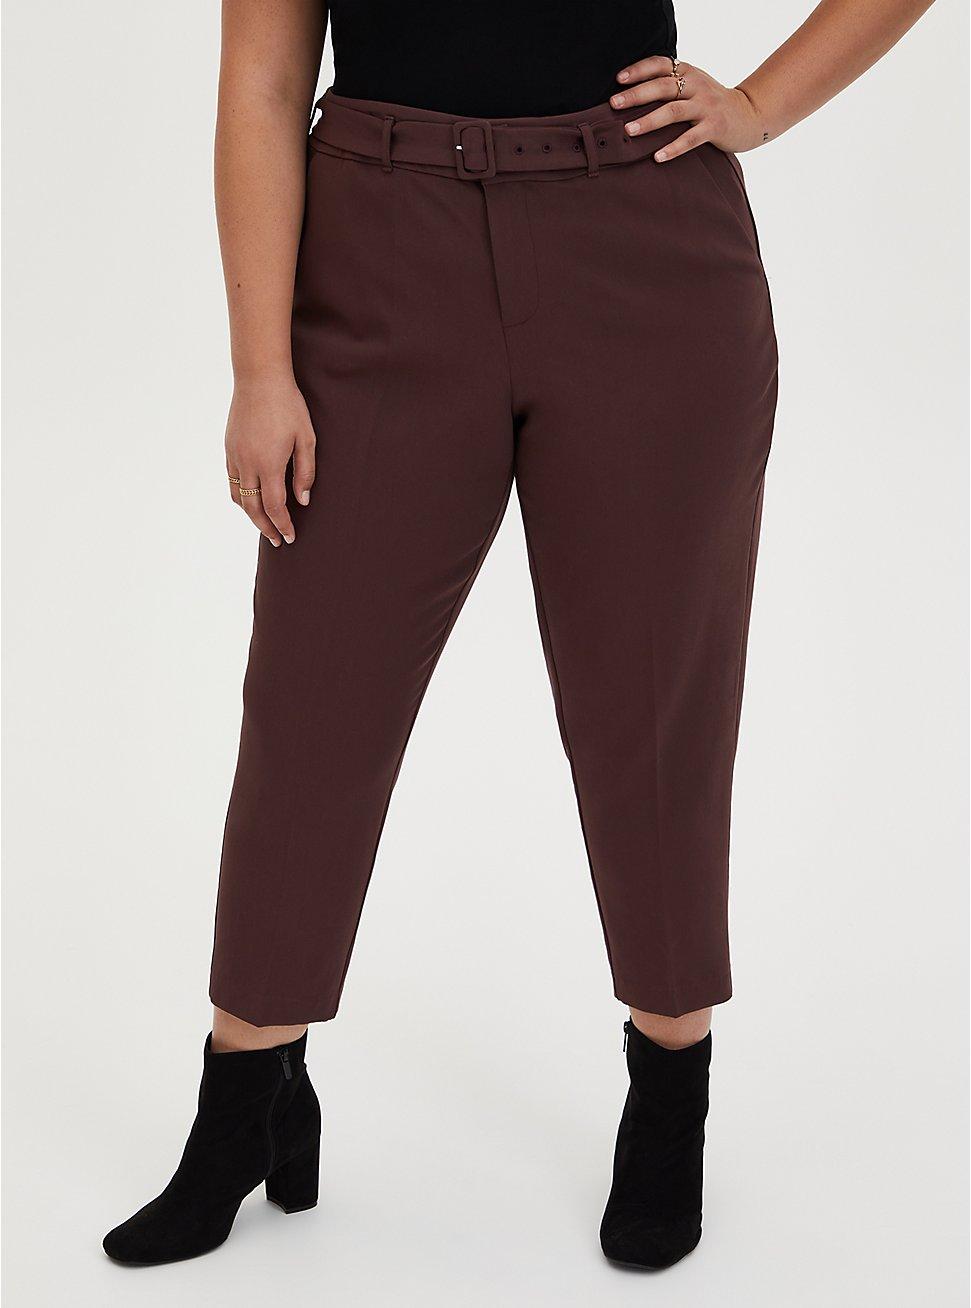 Rust Brown Belted Trouser, DEEP MAHOGANY, hi-res